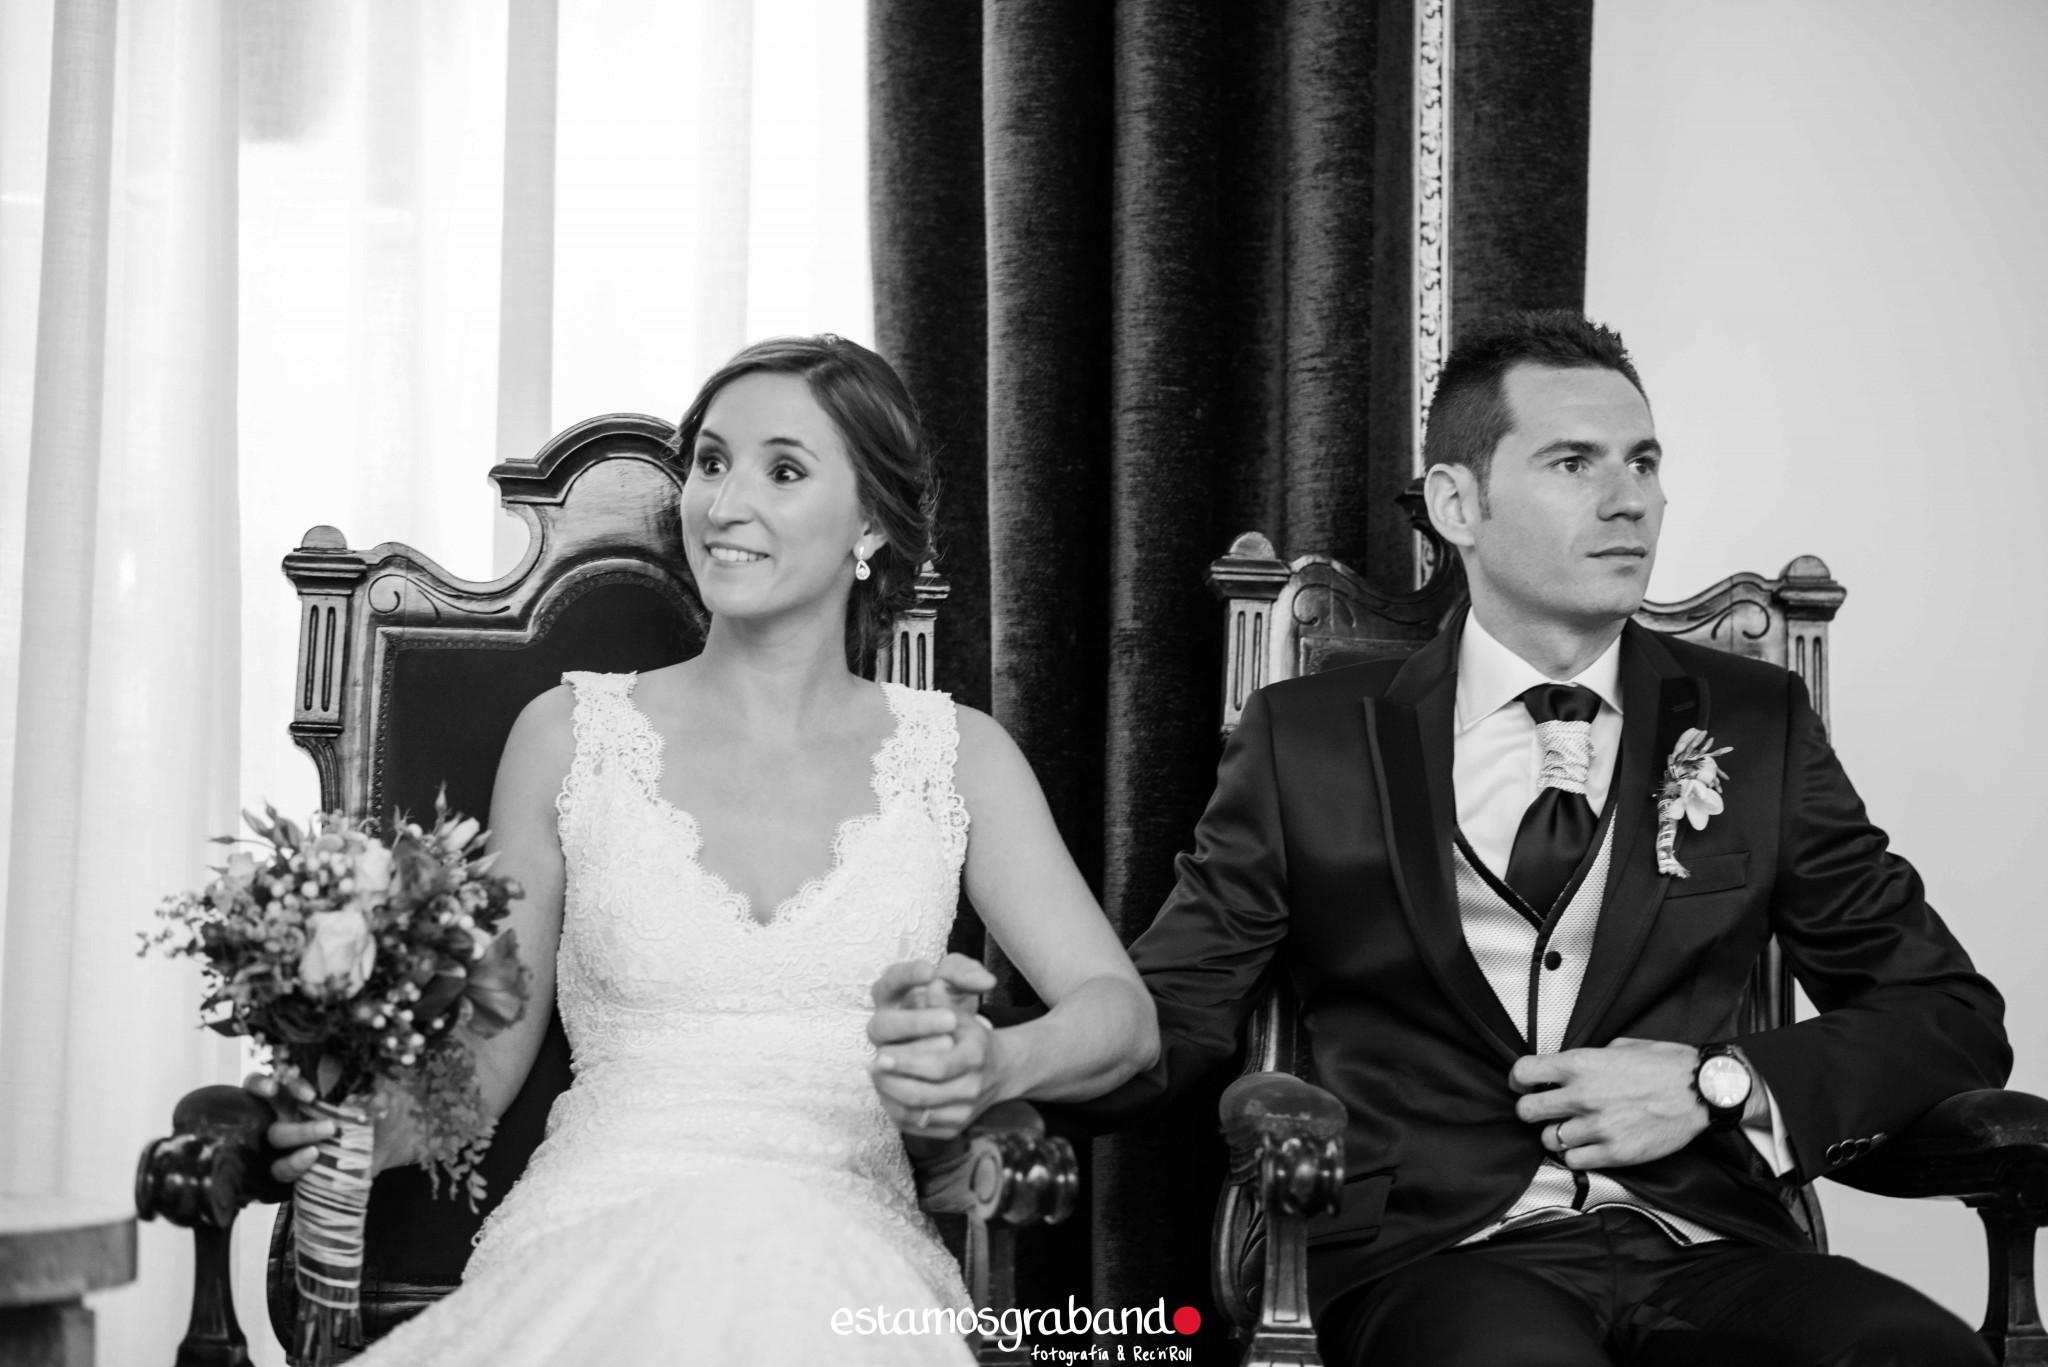 LEO-Y-PEDRO-27 Fotografía de Boda_Leo & Pedro [Jardines de la Mamunia, Granada] - video boda cadiz